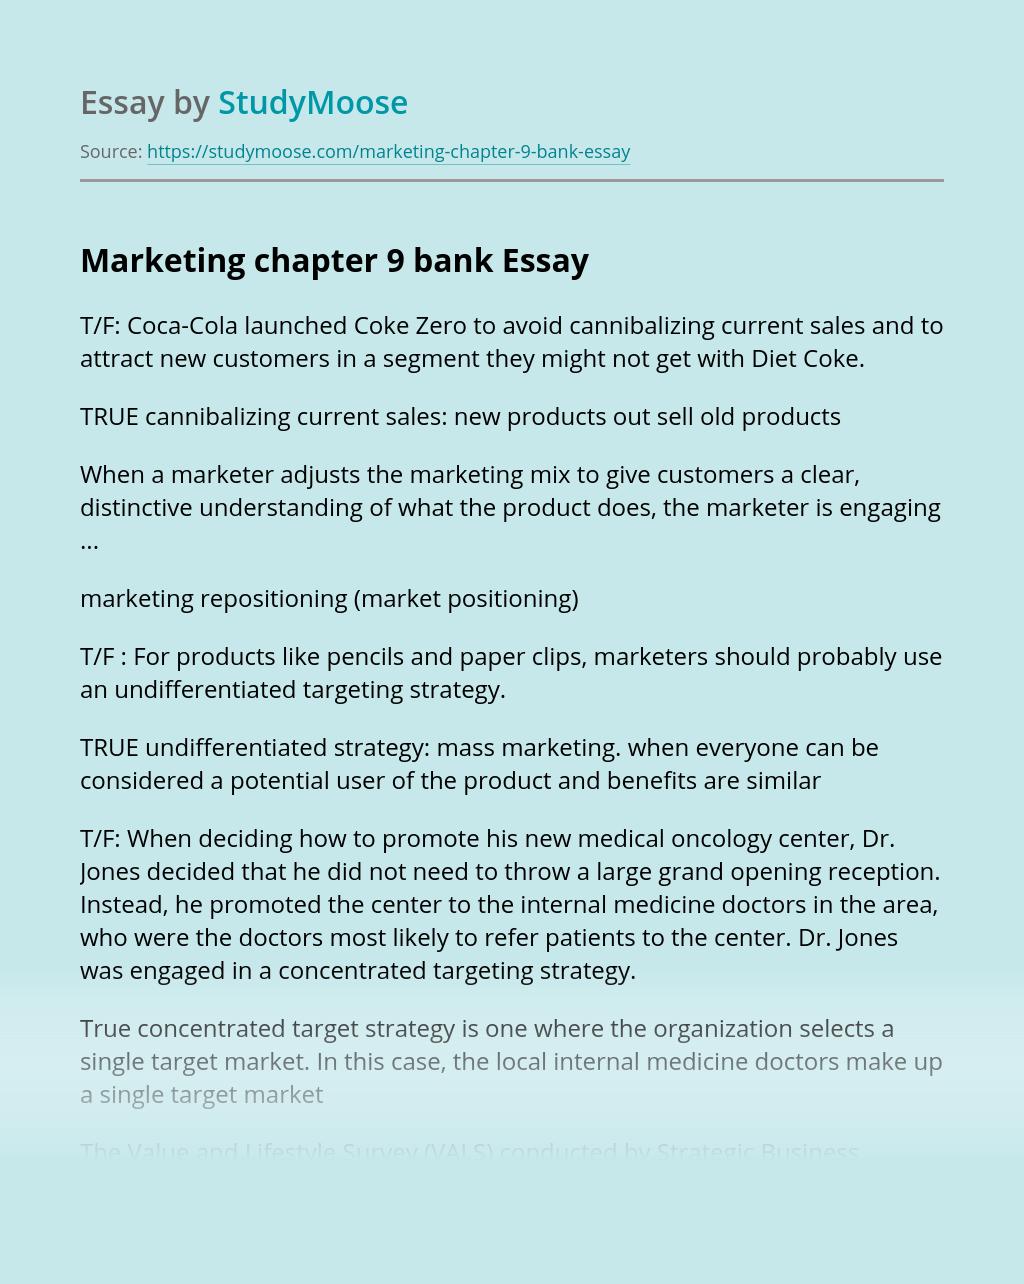 Marketing chapter 9 bank